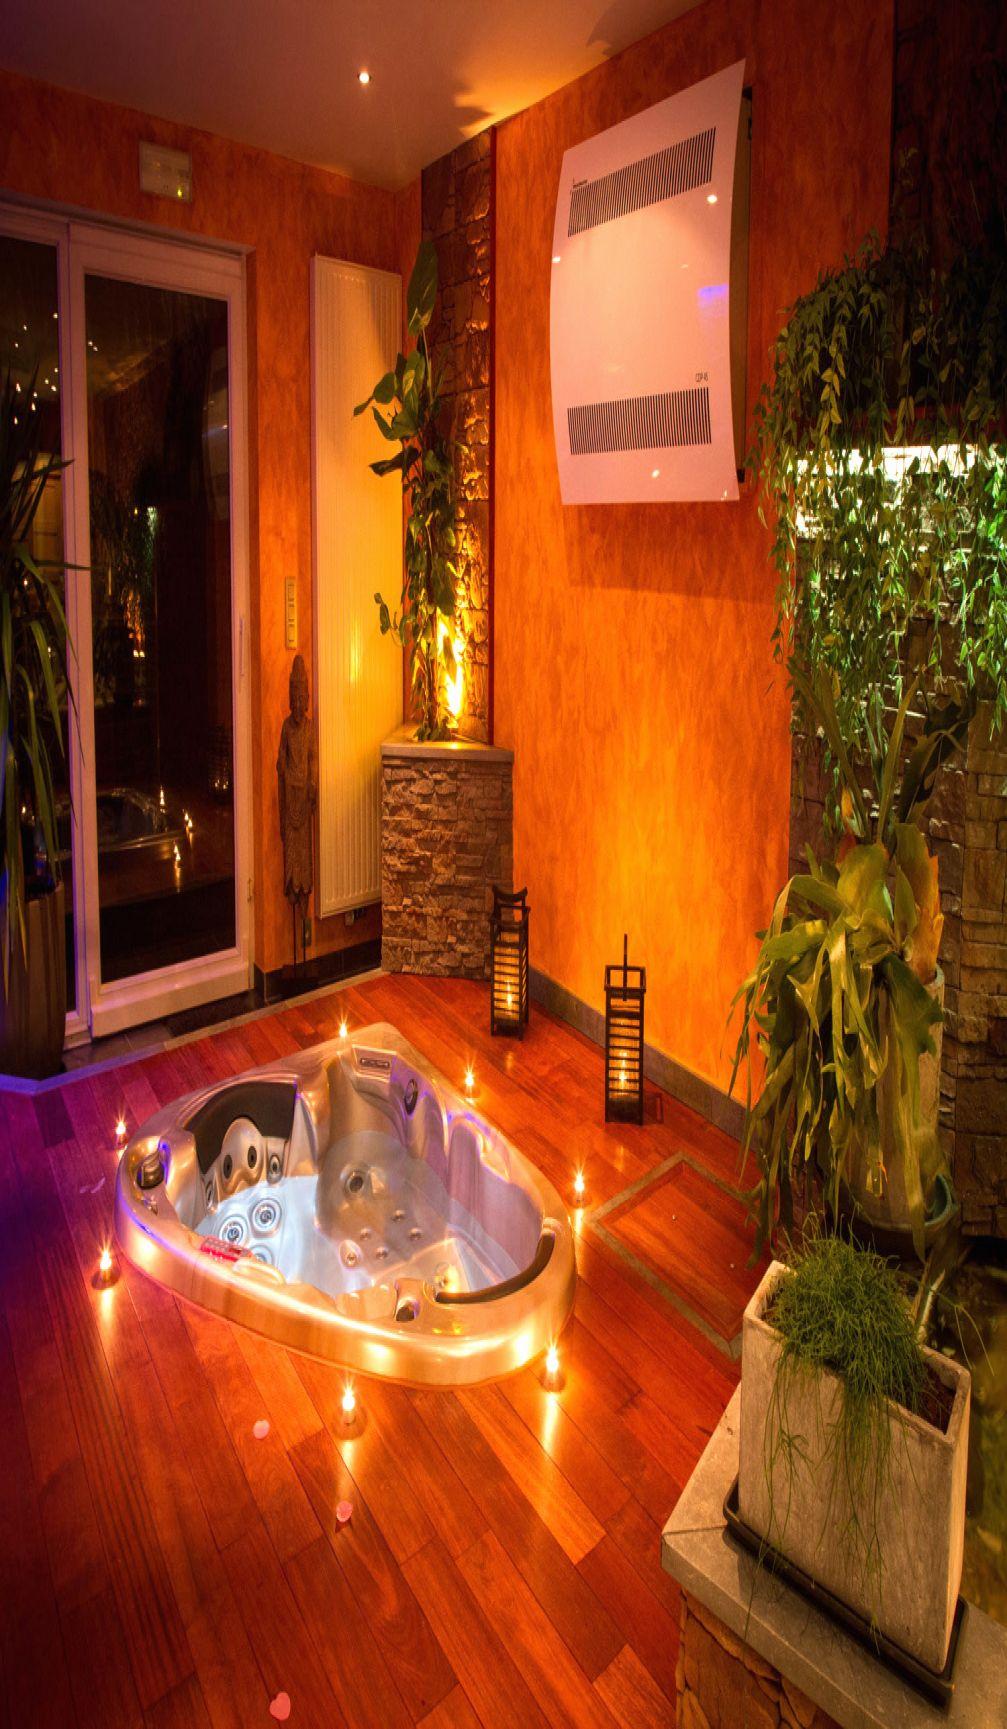 Hotel Avec Jacuzzi Dans La Chambre Bretagne Chambres Avec Jacuzzi En 2020 Chambre Spa Privatif Jacuzzi Spa Privatif